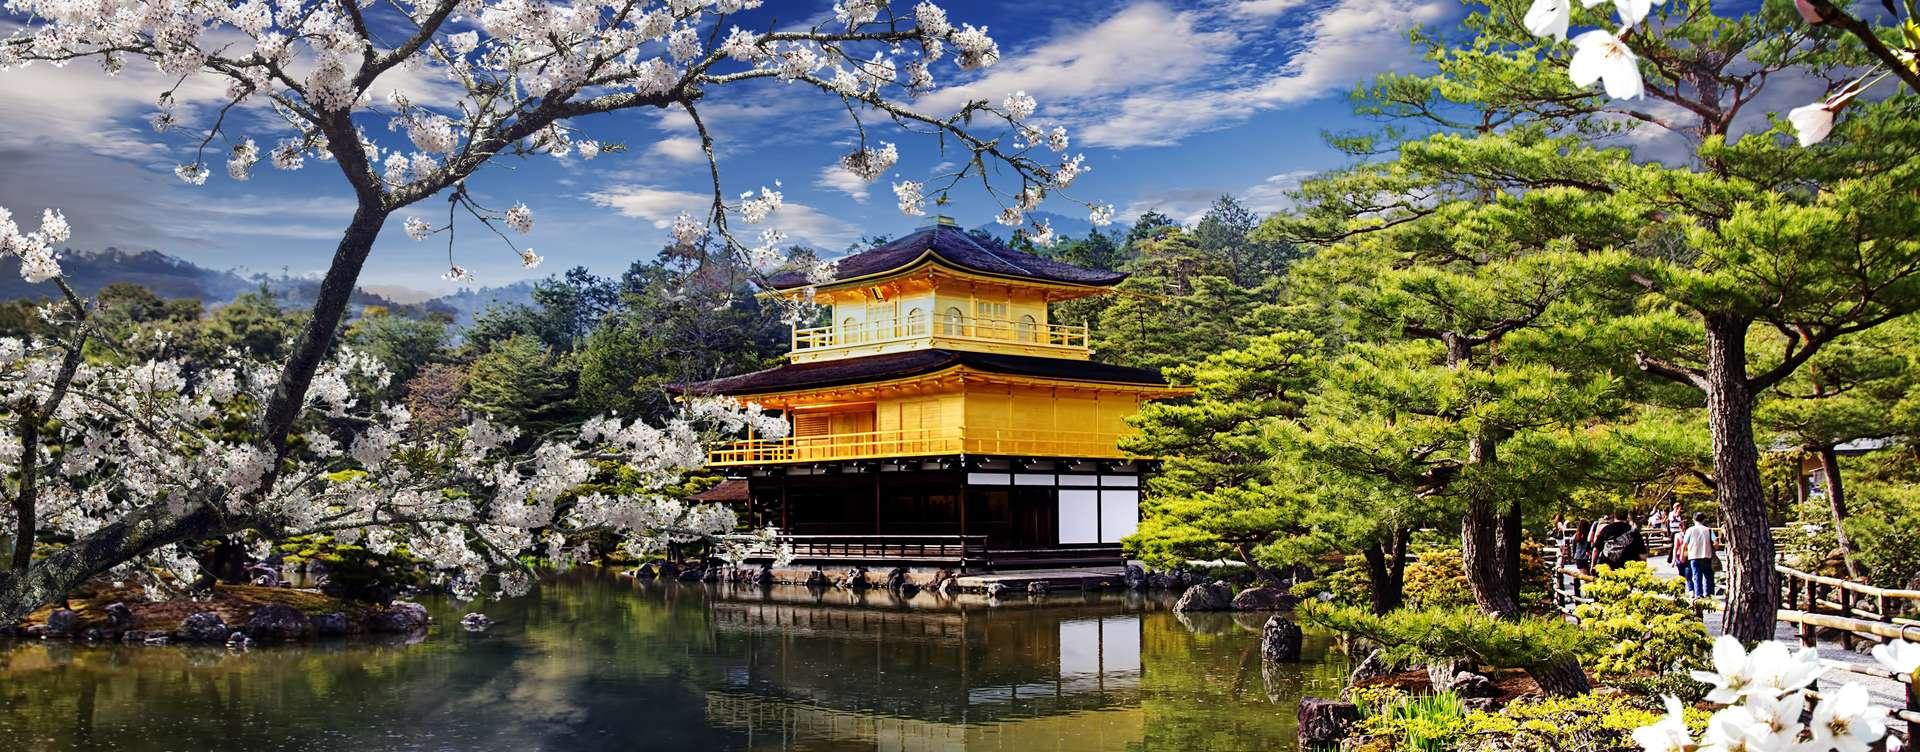 SJA   Japan   Kyoto   Gouden Tempel   Sakura   shutterstock 136606331